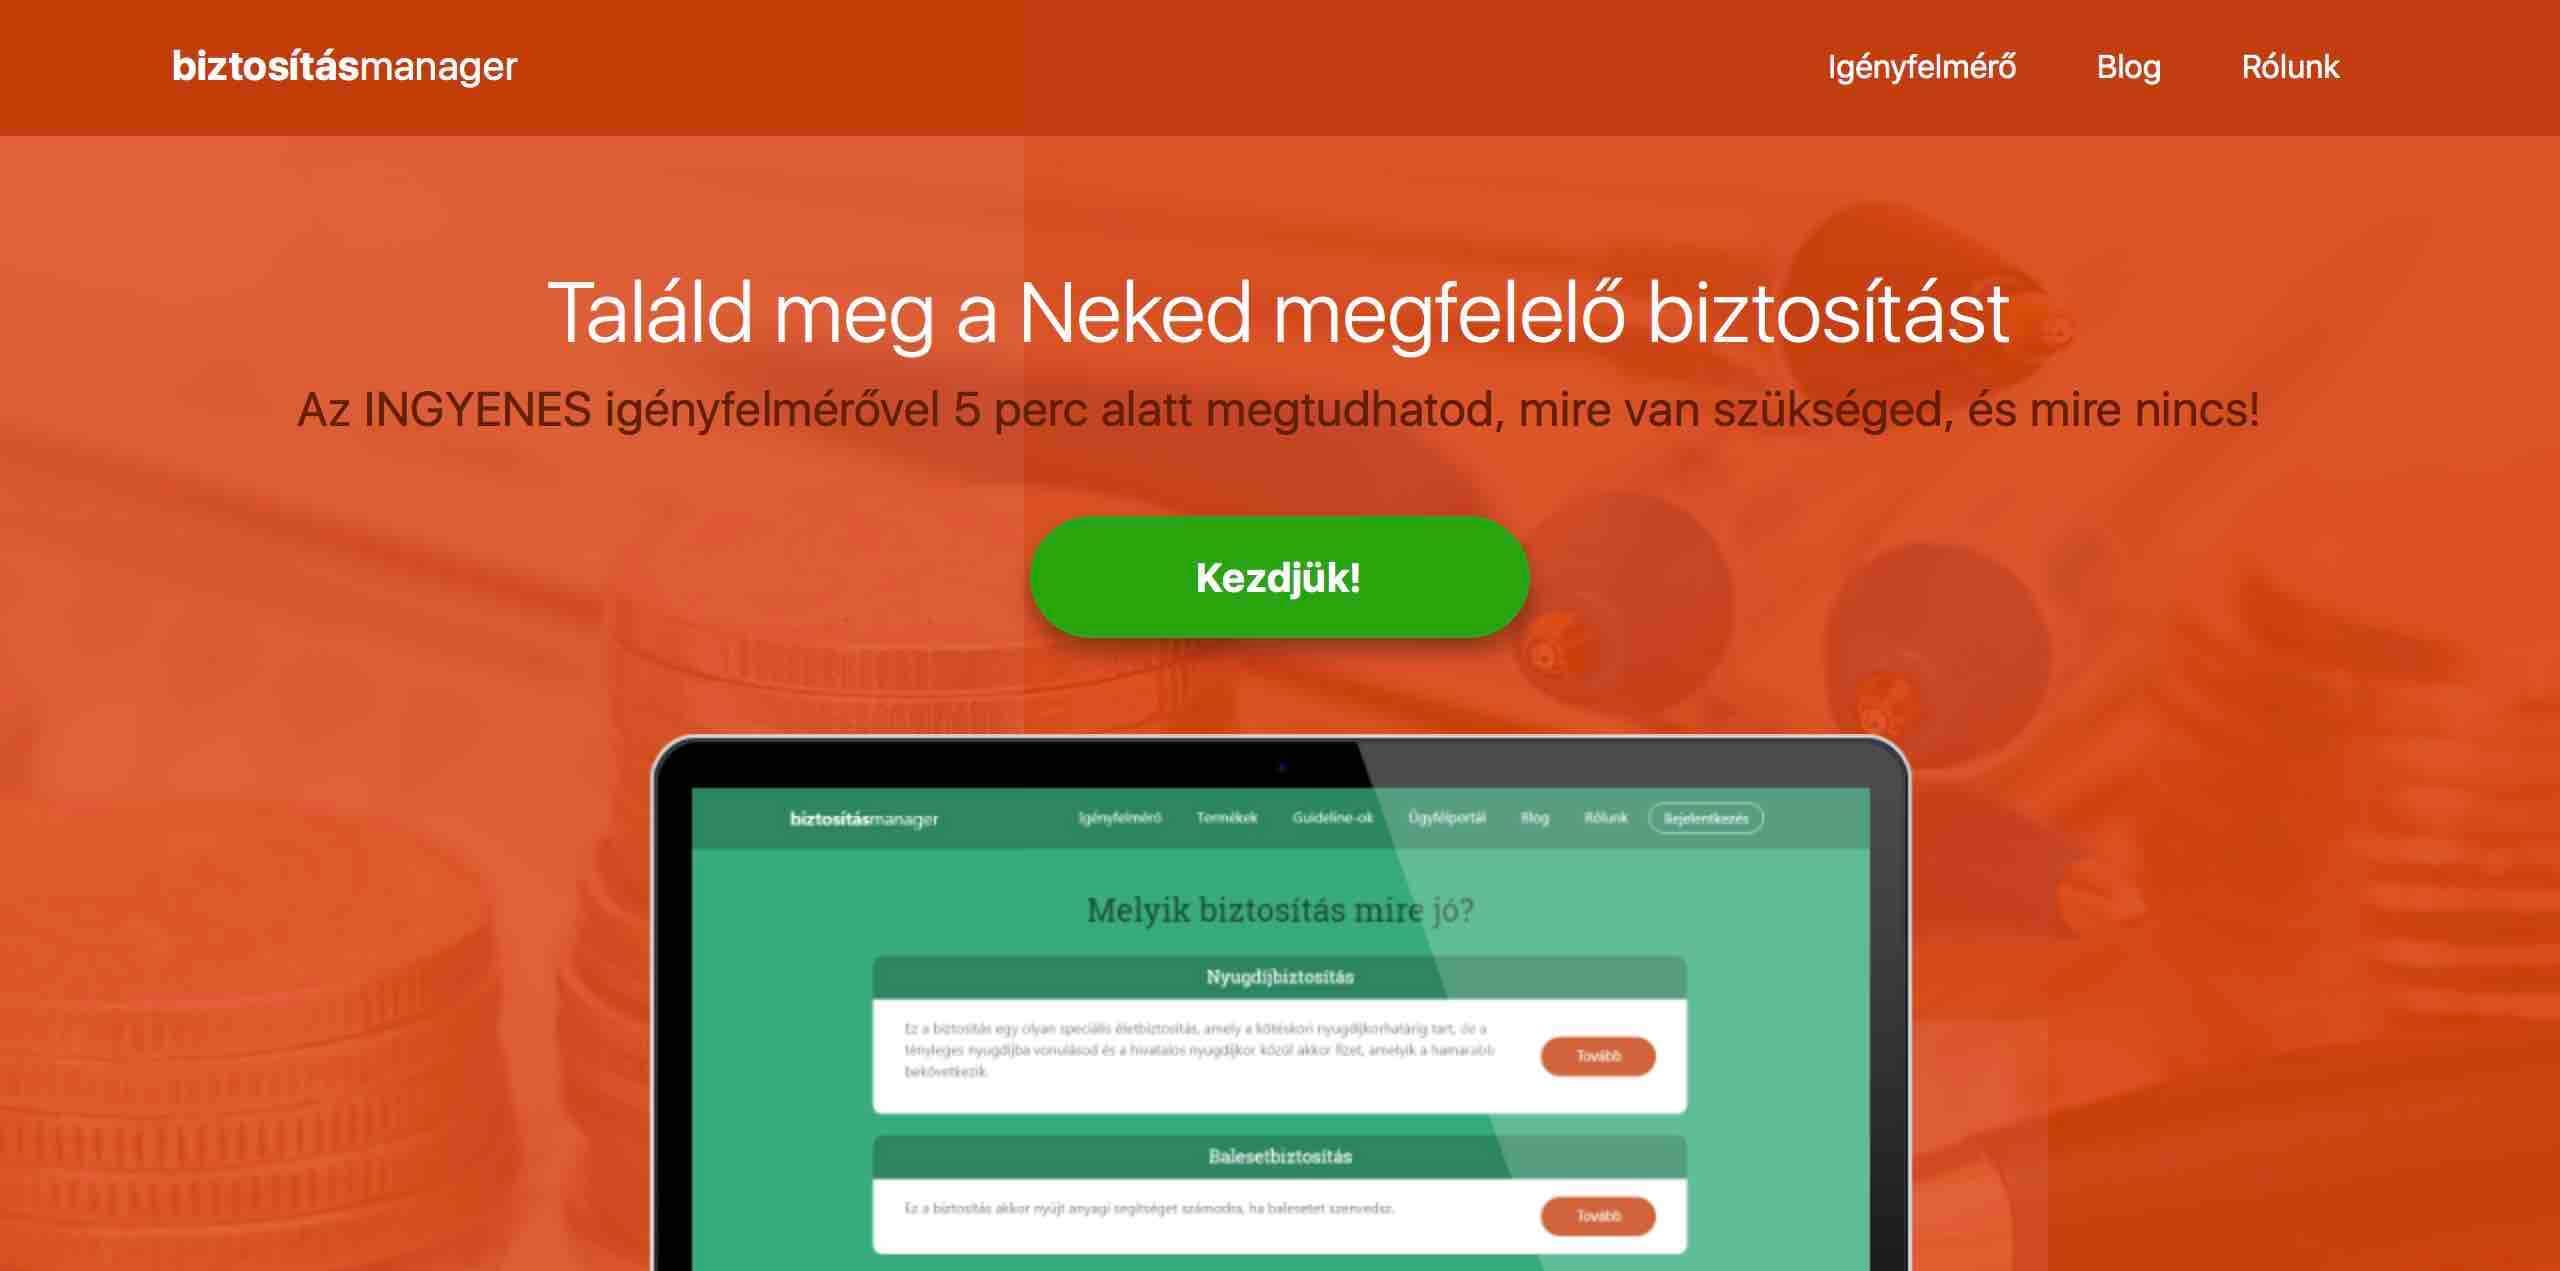 insurtech biztositasmanager startup